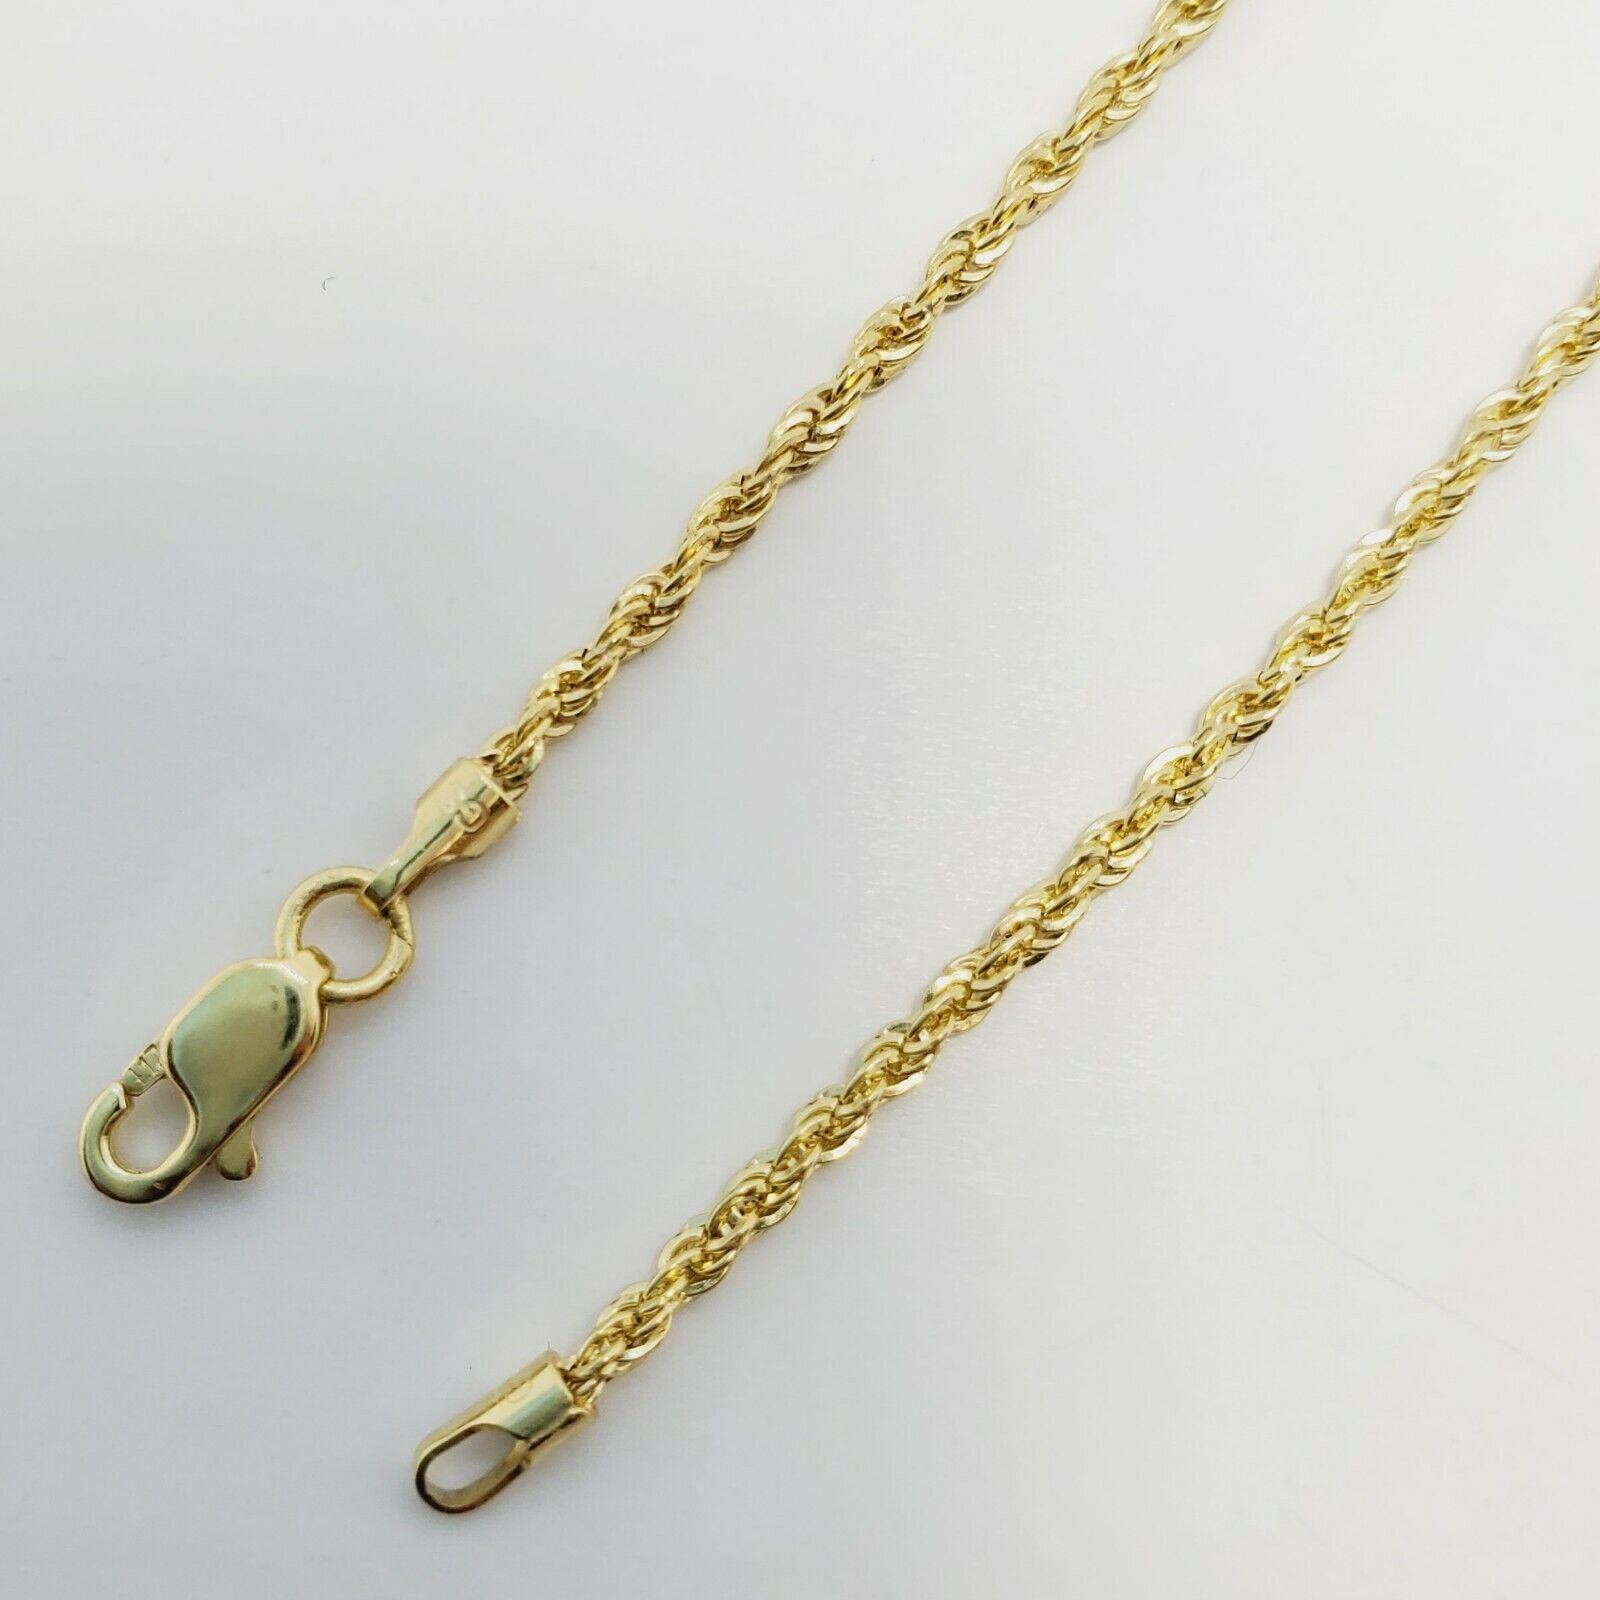 "10K Yellow Gold 1.5mm Diamond Cut Rope Chain Pendant Necklace Mens Women 16""-26"" 4"